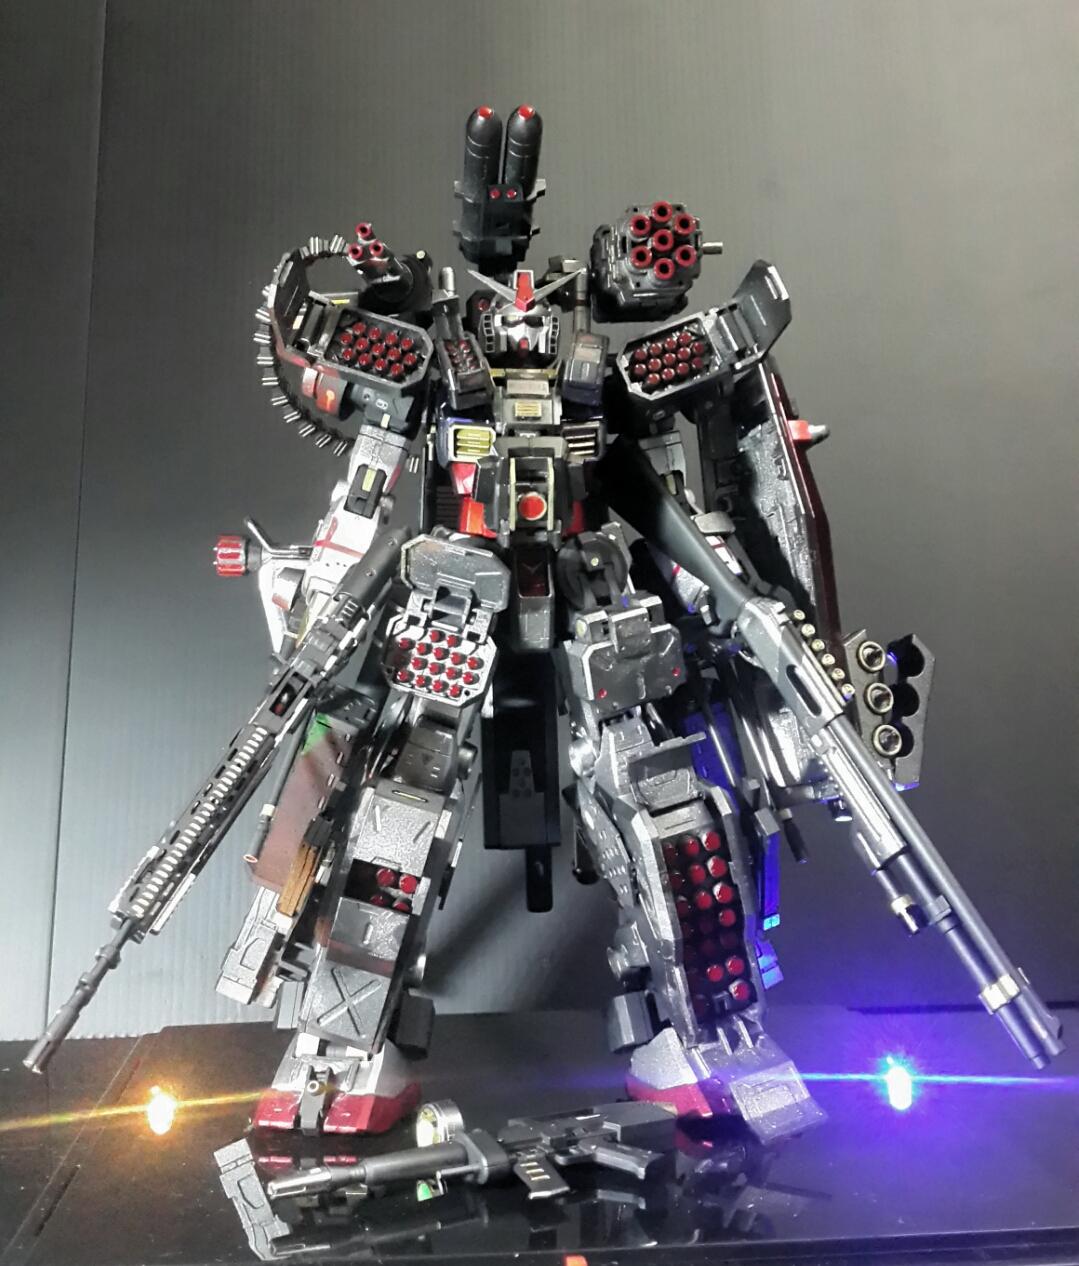 GUNDAM GUY: MG 1/100 RX-78-2 Gundam Heavyarms Custom